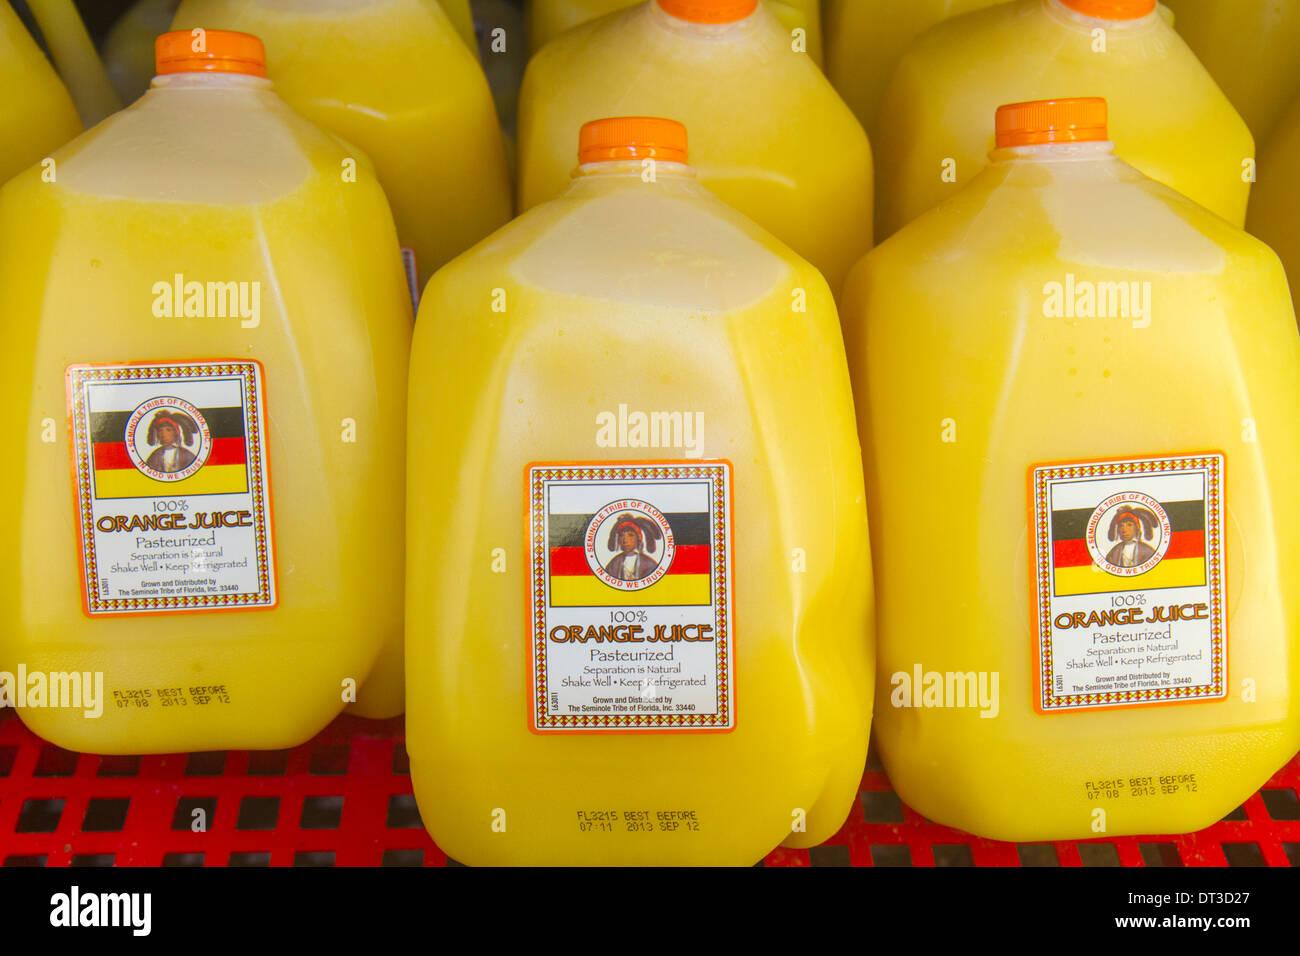 Florida Okeechobee Seminole Tribe Brighton Indian Reservation Native American Trading Post & RV Resort orange juice gallon plas - Stock Image